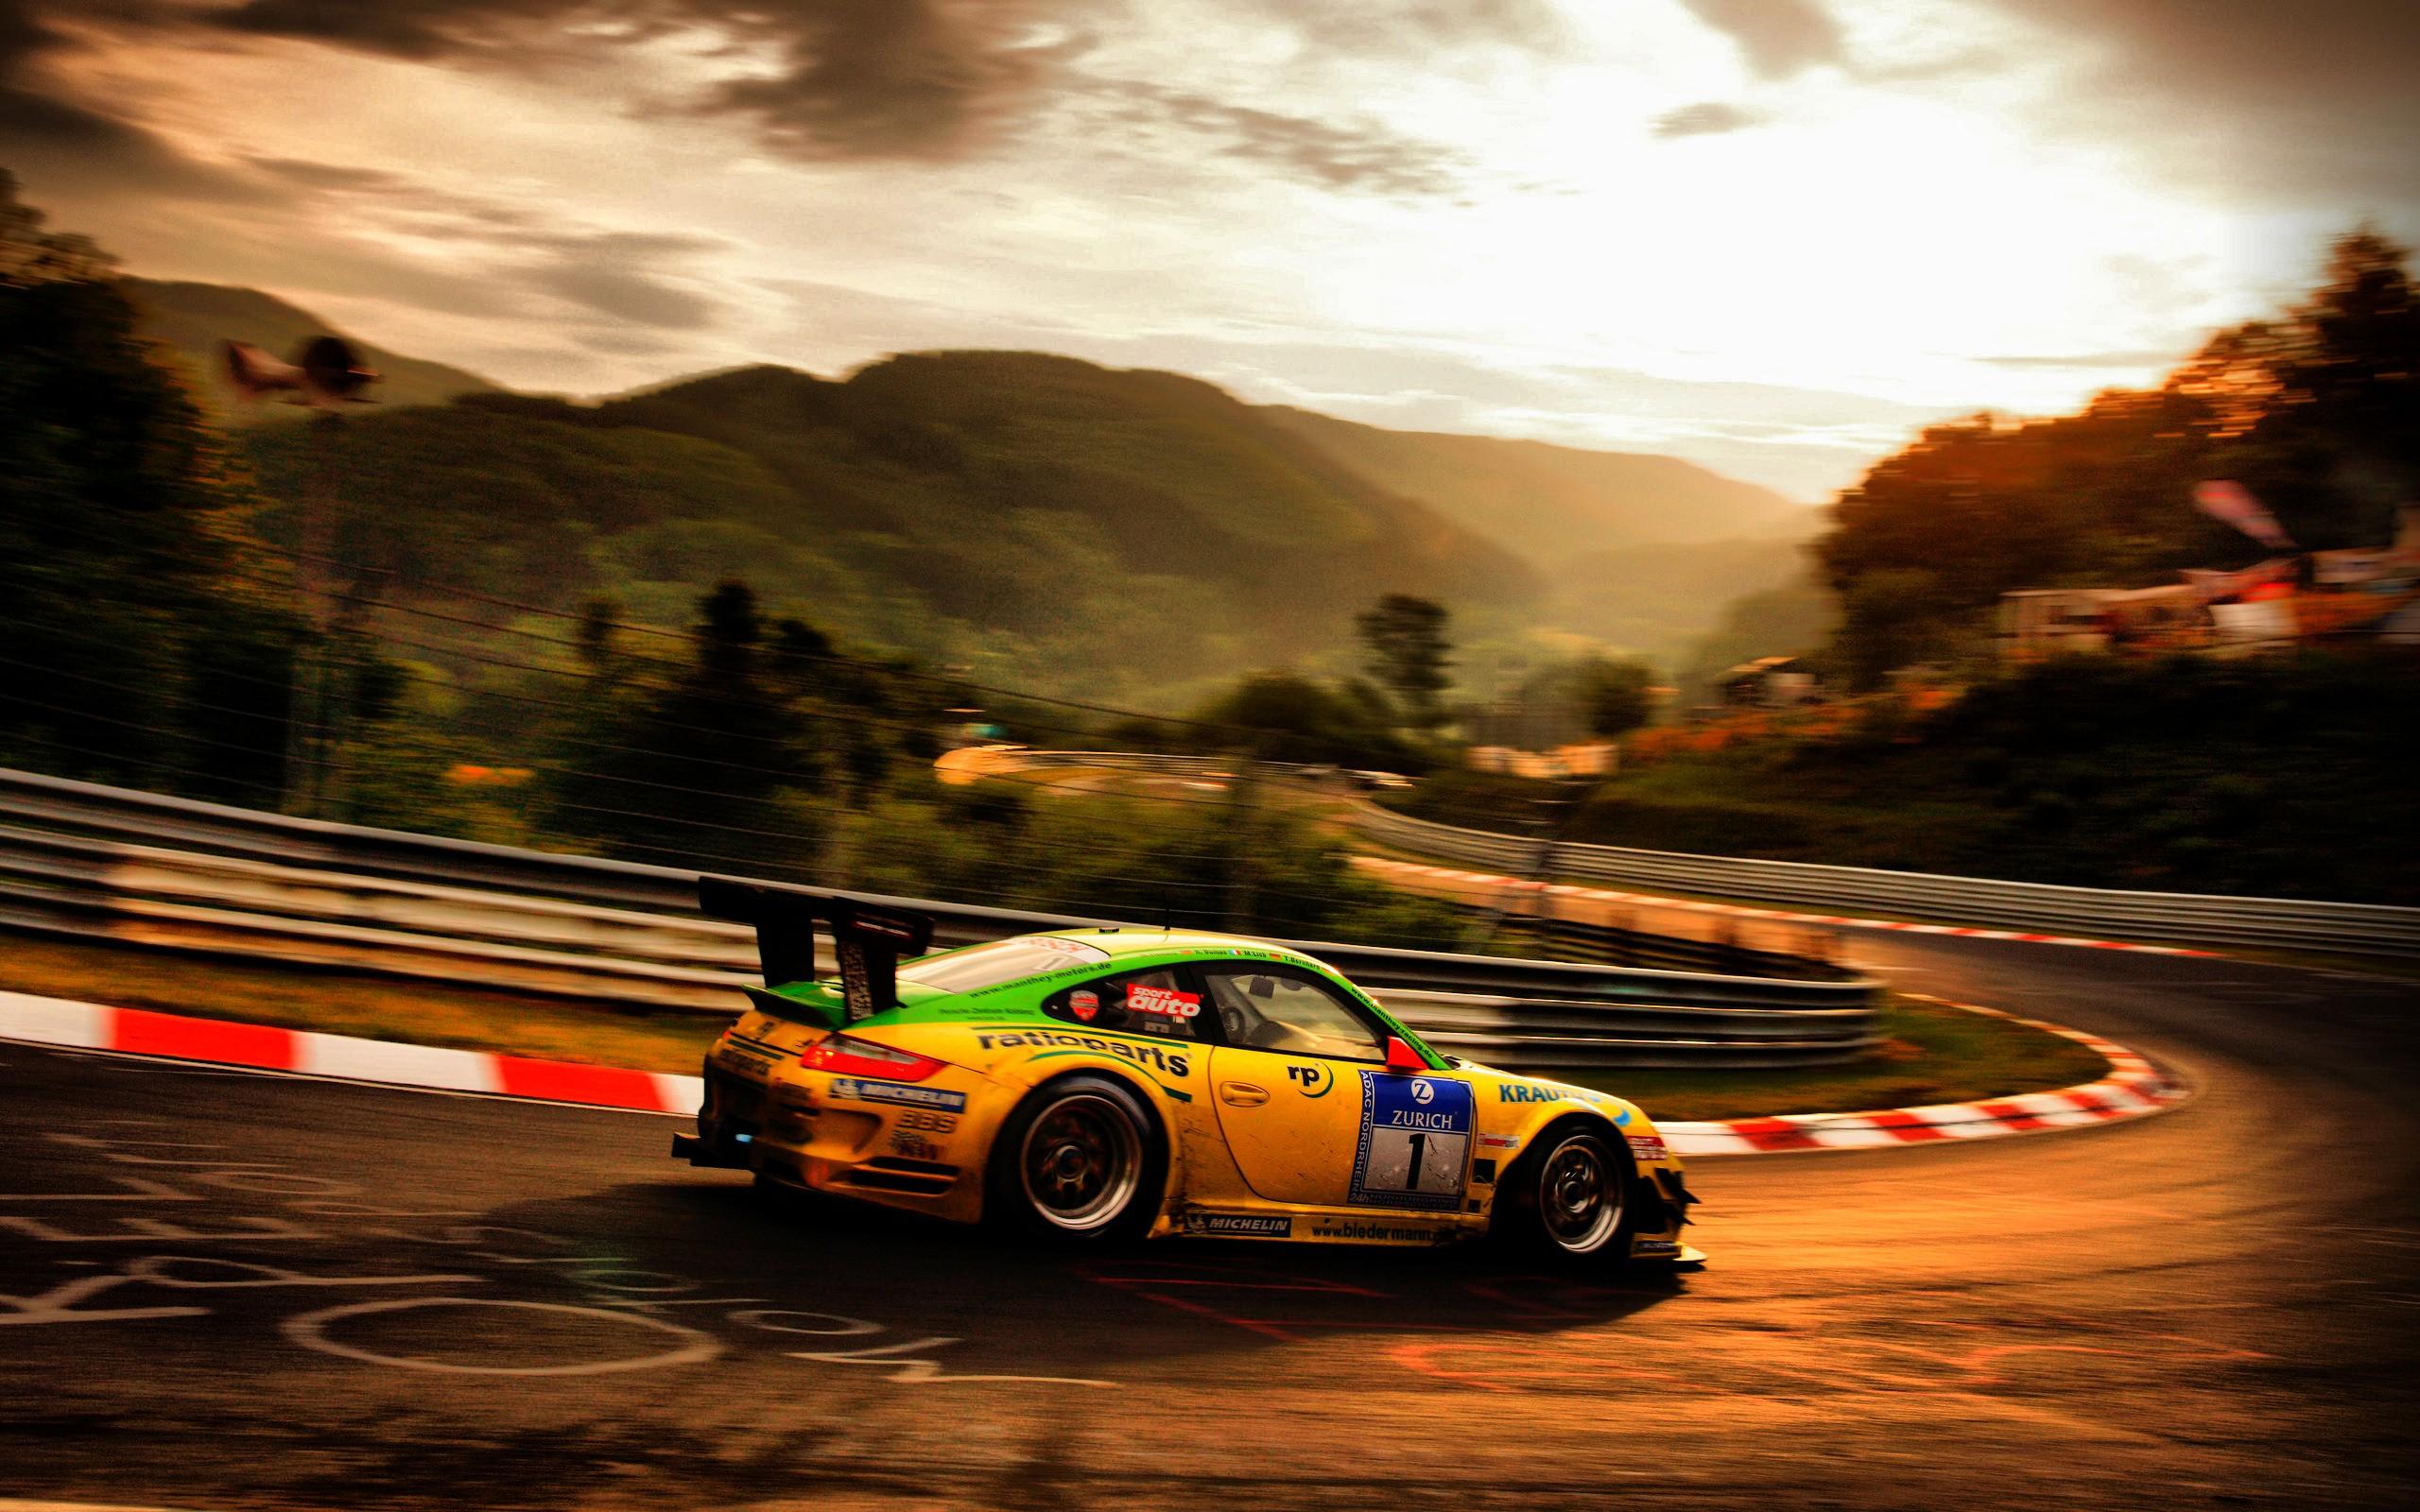 Porsche 911 Hd Wallpapers Wallpapersafari